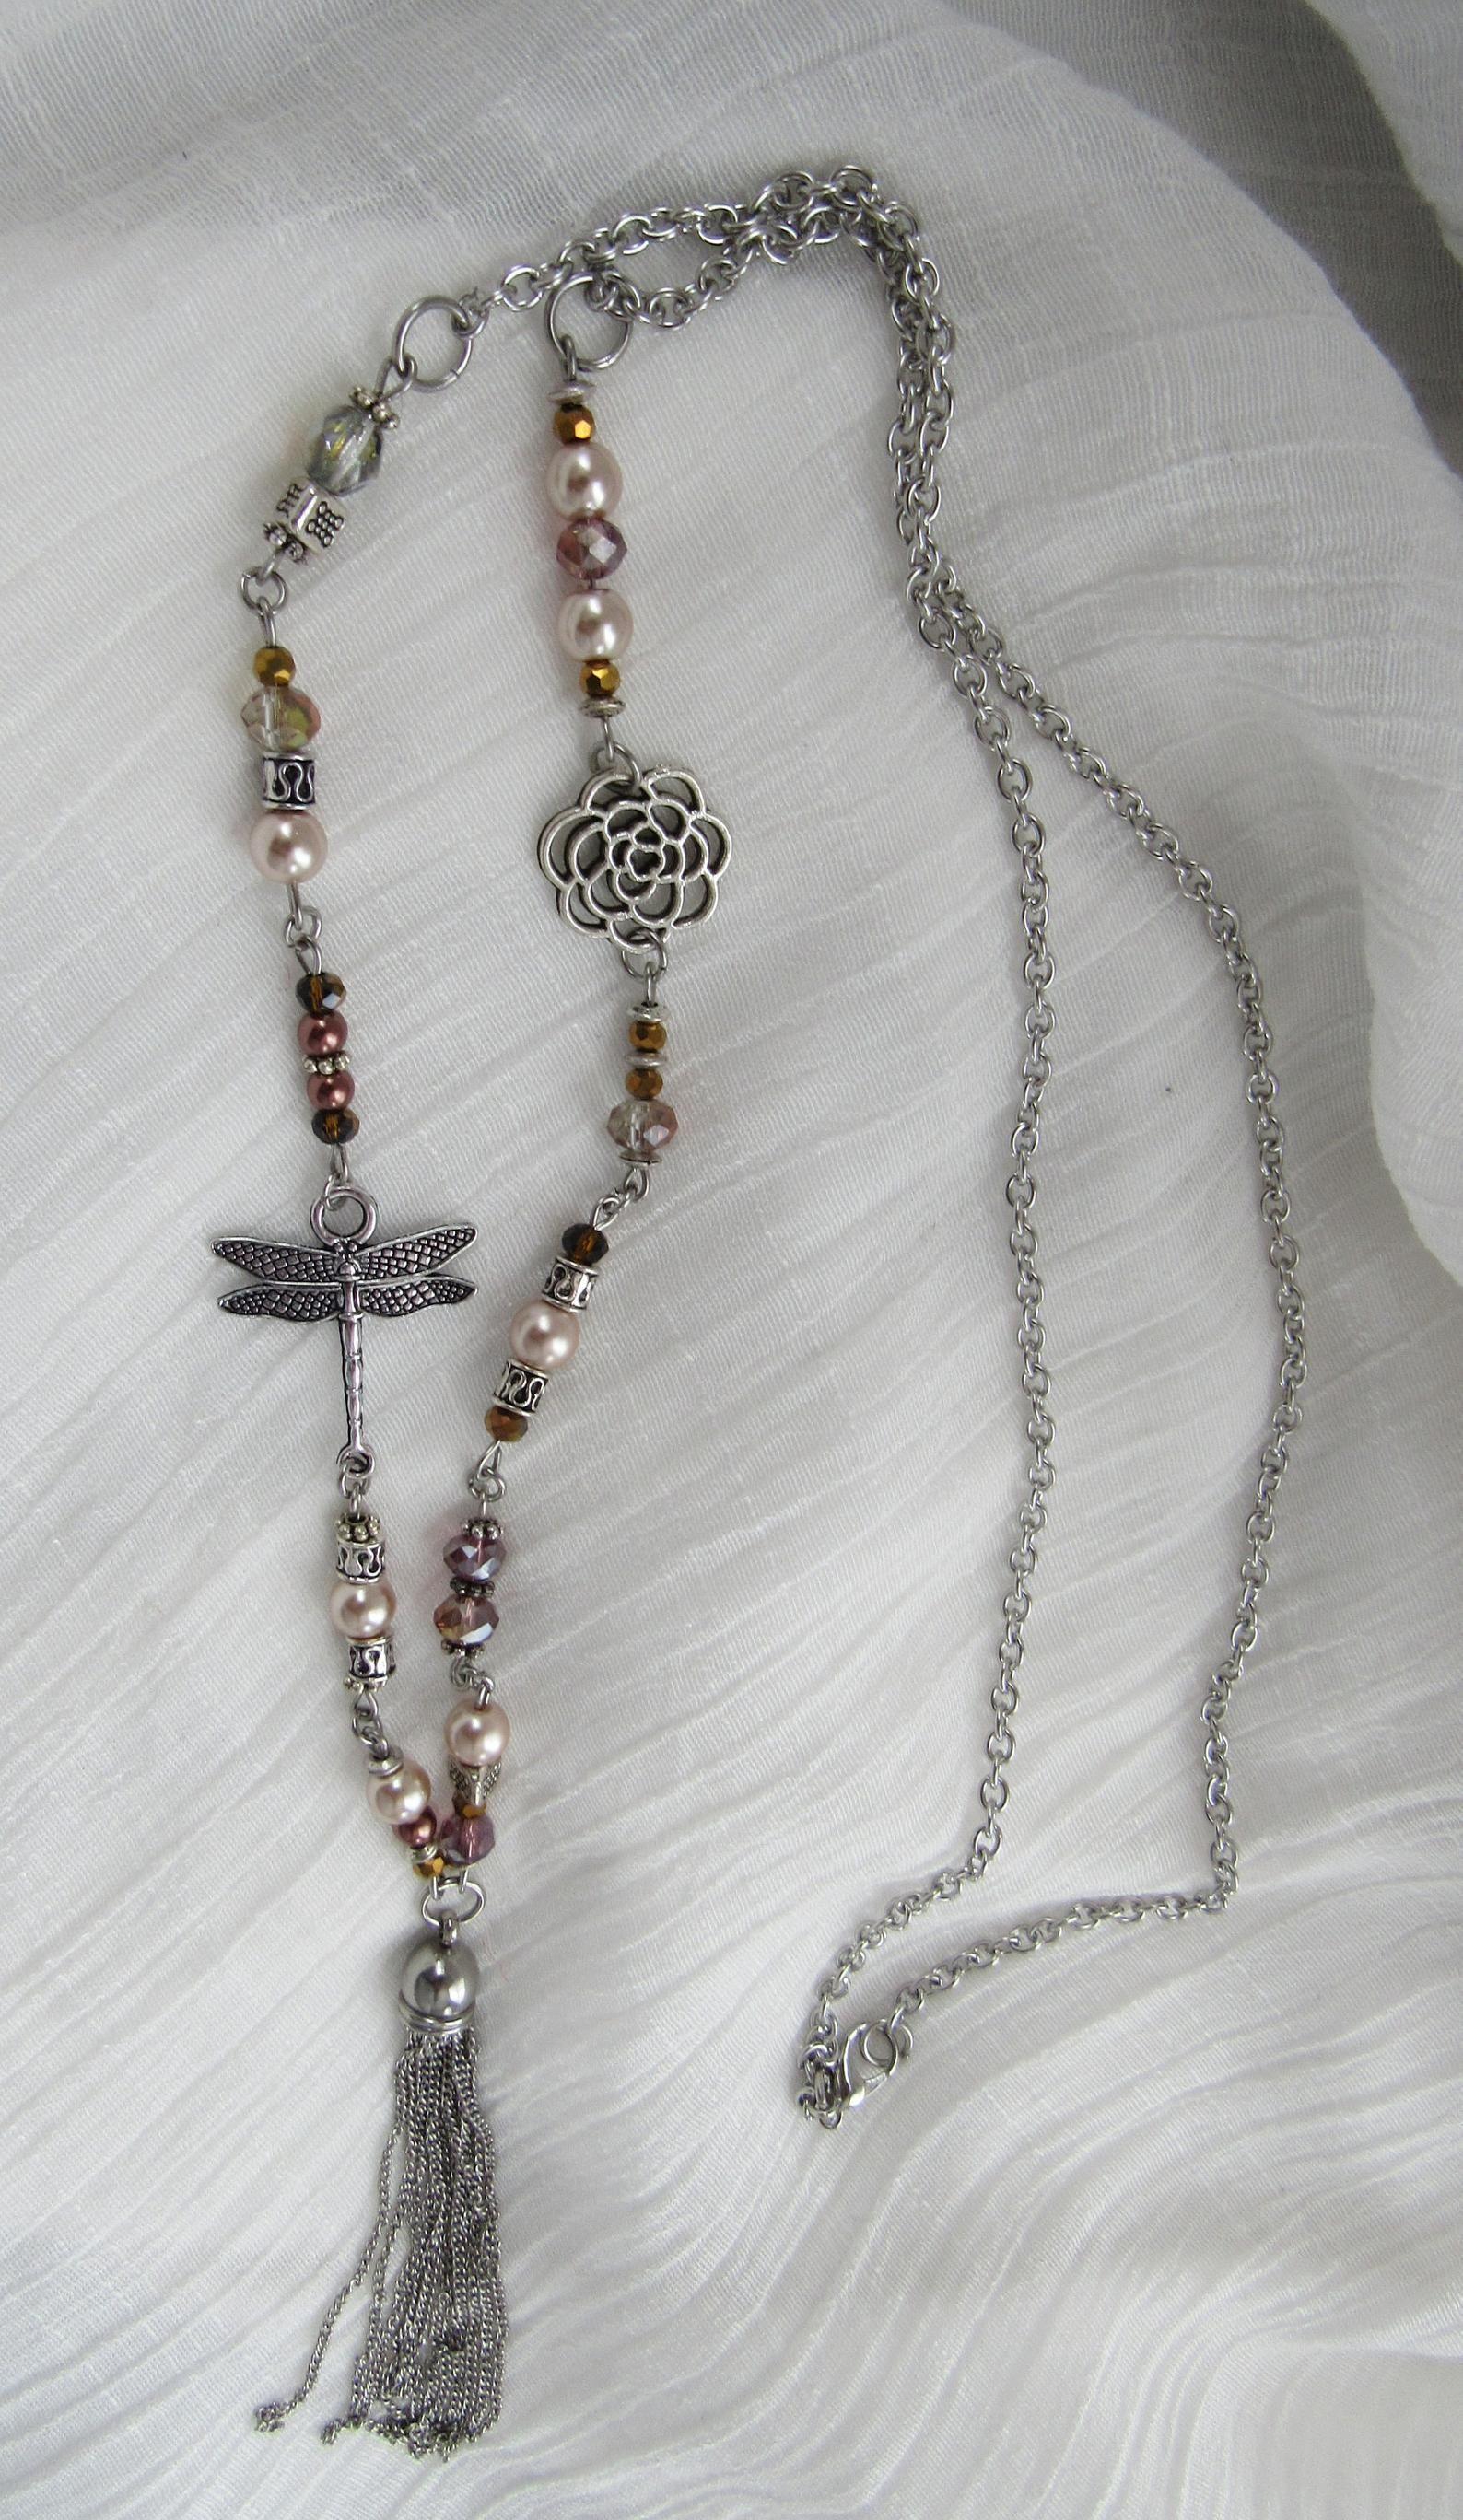 Boho Bohemian | Long Necklace | Tassel Charm | Hippie | Beaded Necklace | Boho Chic | Necklace | Hand Beaded Chain | Stainless Steel Chain